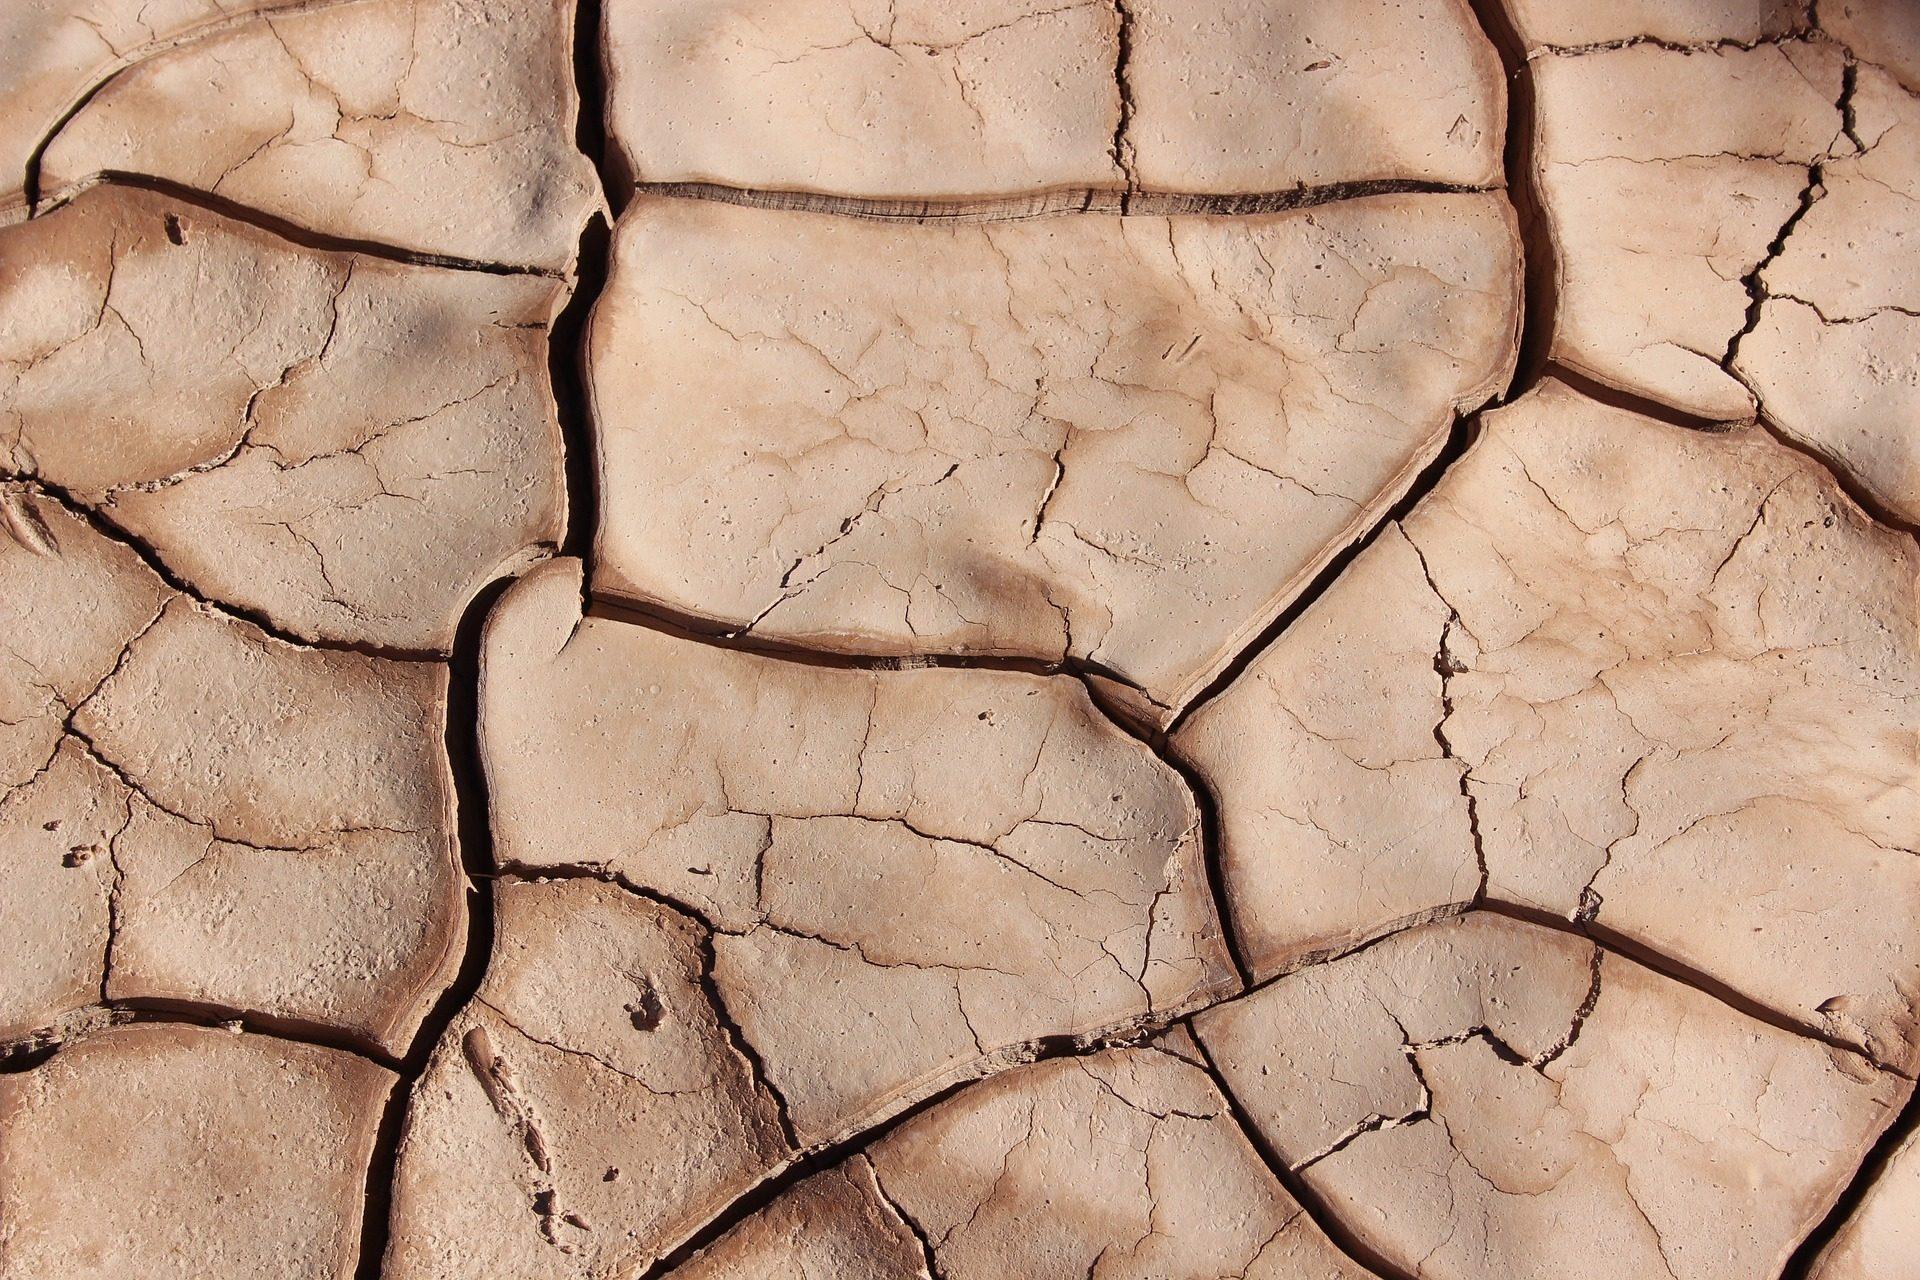 Boden, gebrochen, sequía, Erde, Risse - Wallpaper HD - Prof.-falken.com